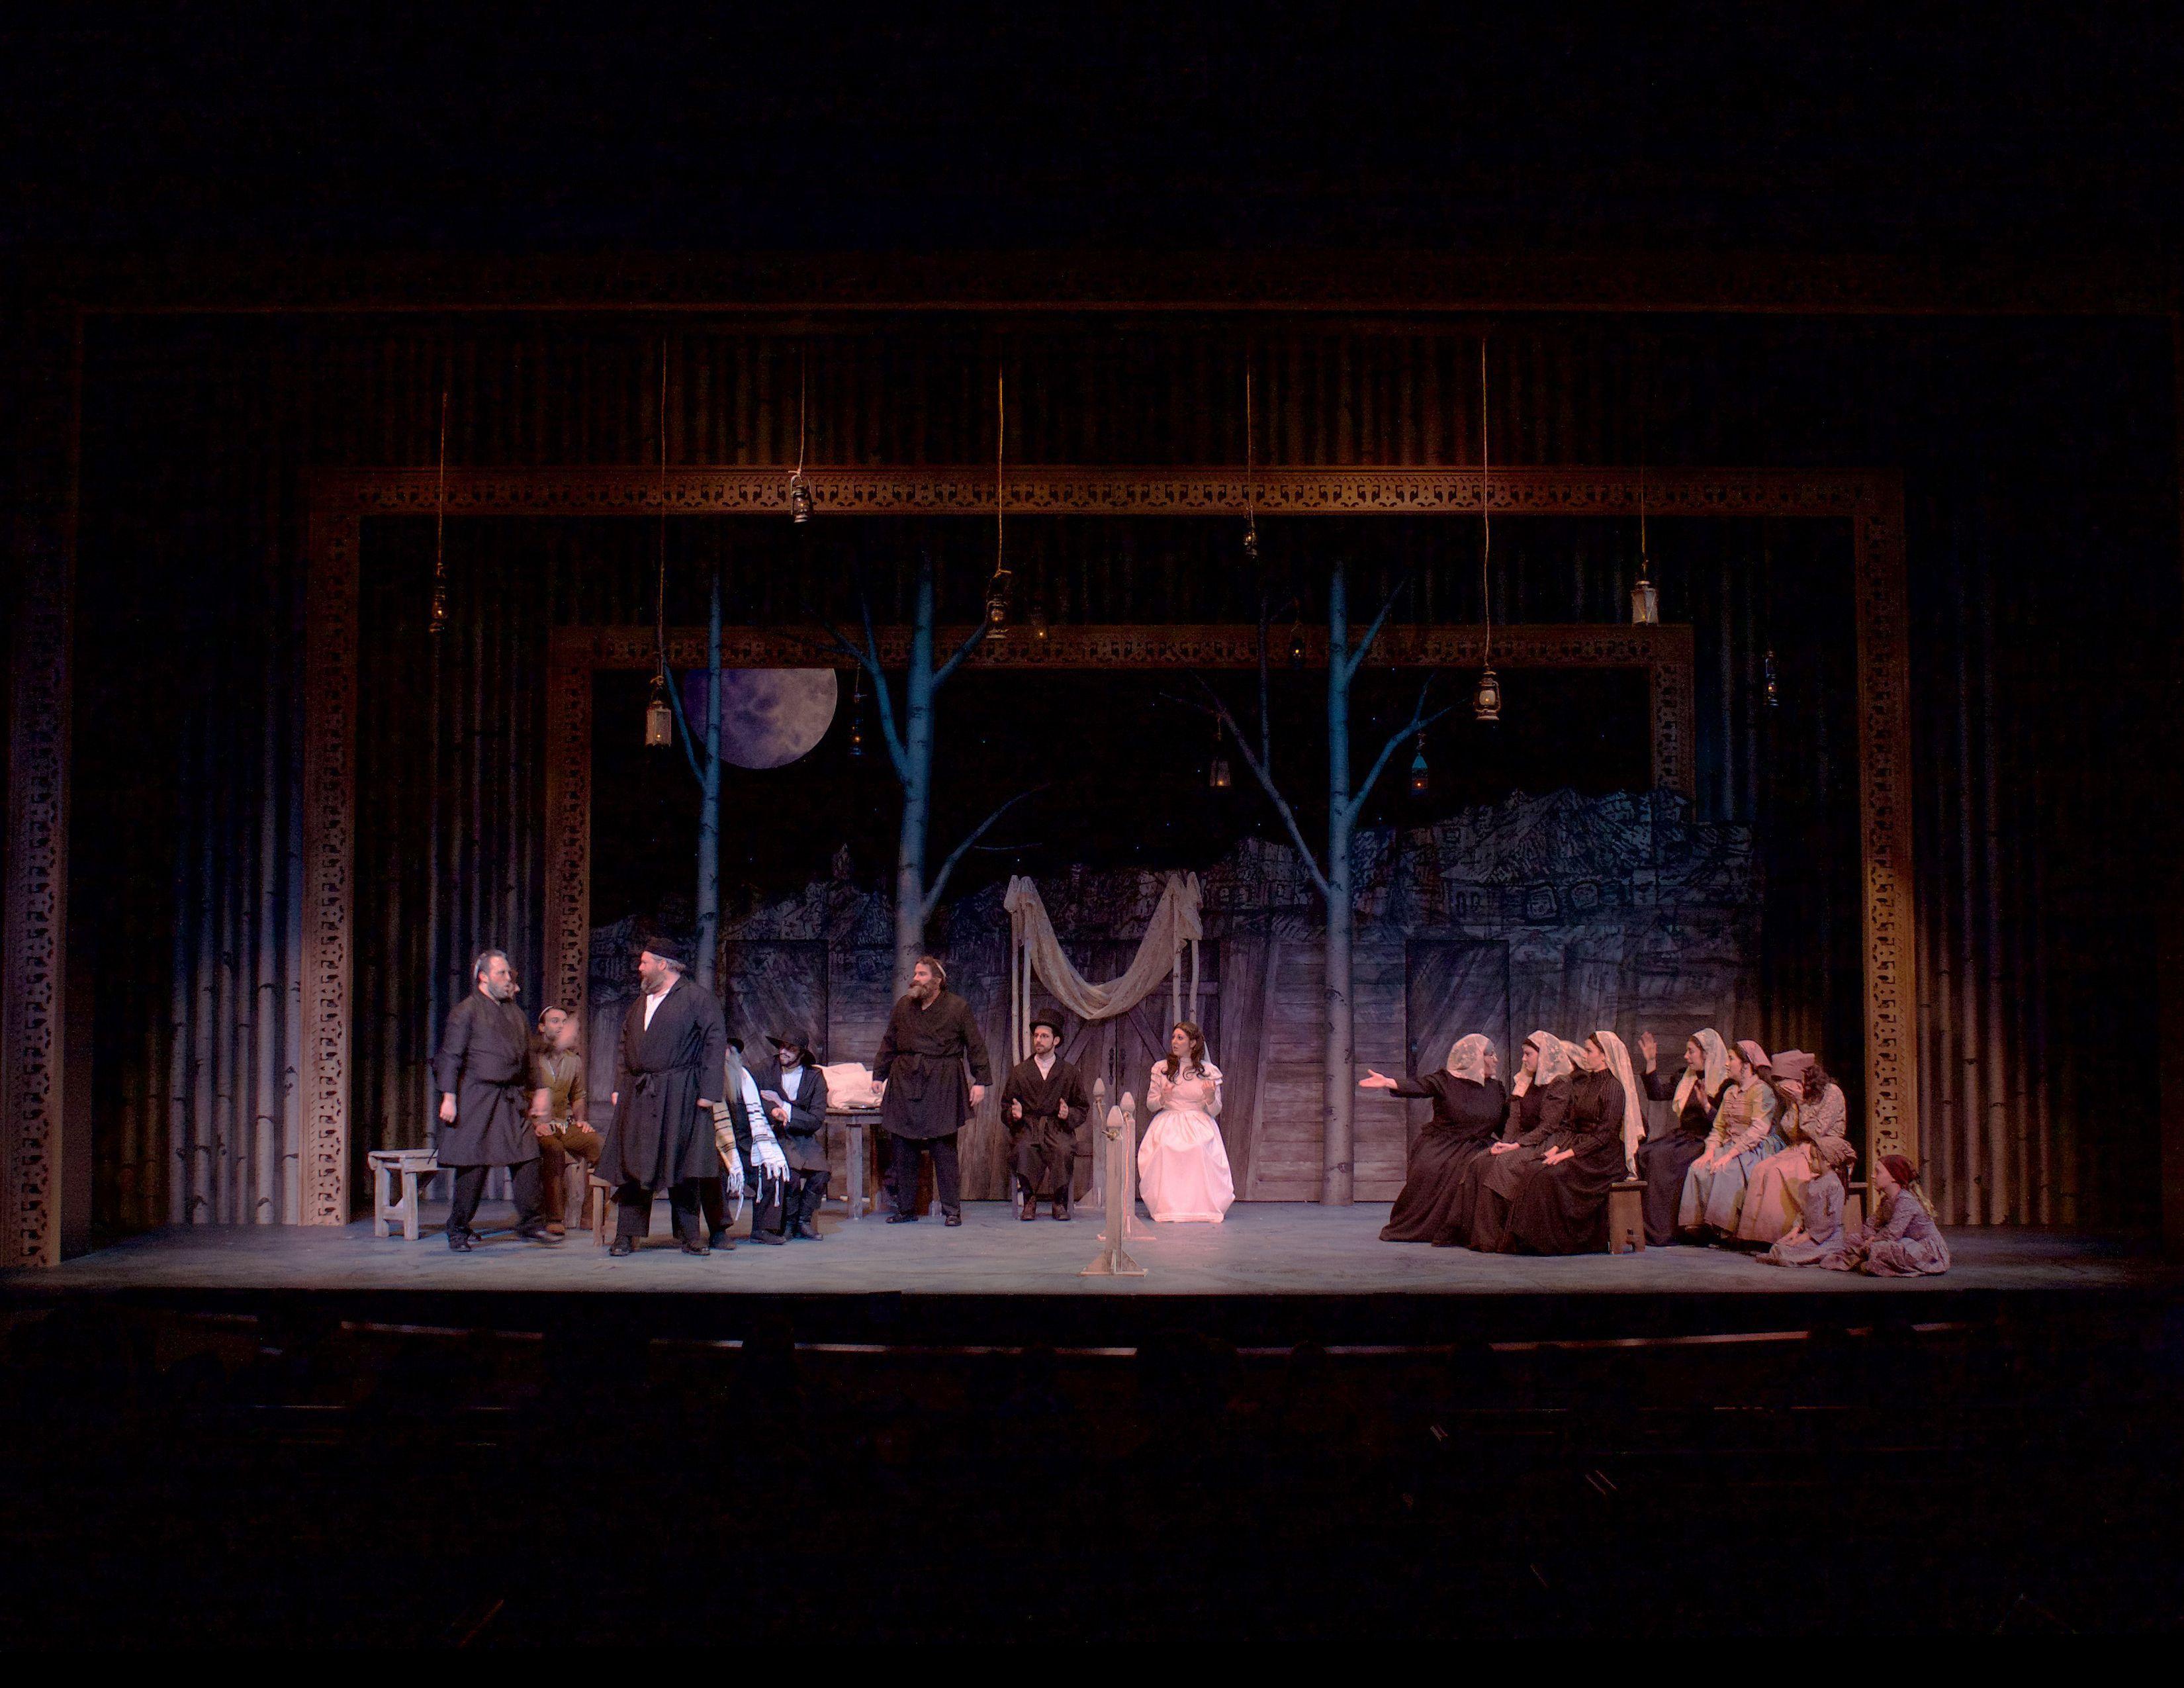 Fiddler On The Roof Arizona Broadway Theatre Set By Douglas Clarke Douglasclarkedesign Com Fiddler On The Roof Scenic Design Theatre Set